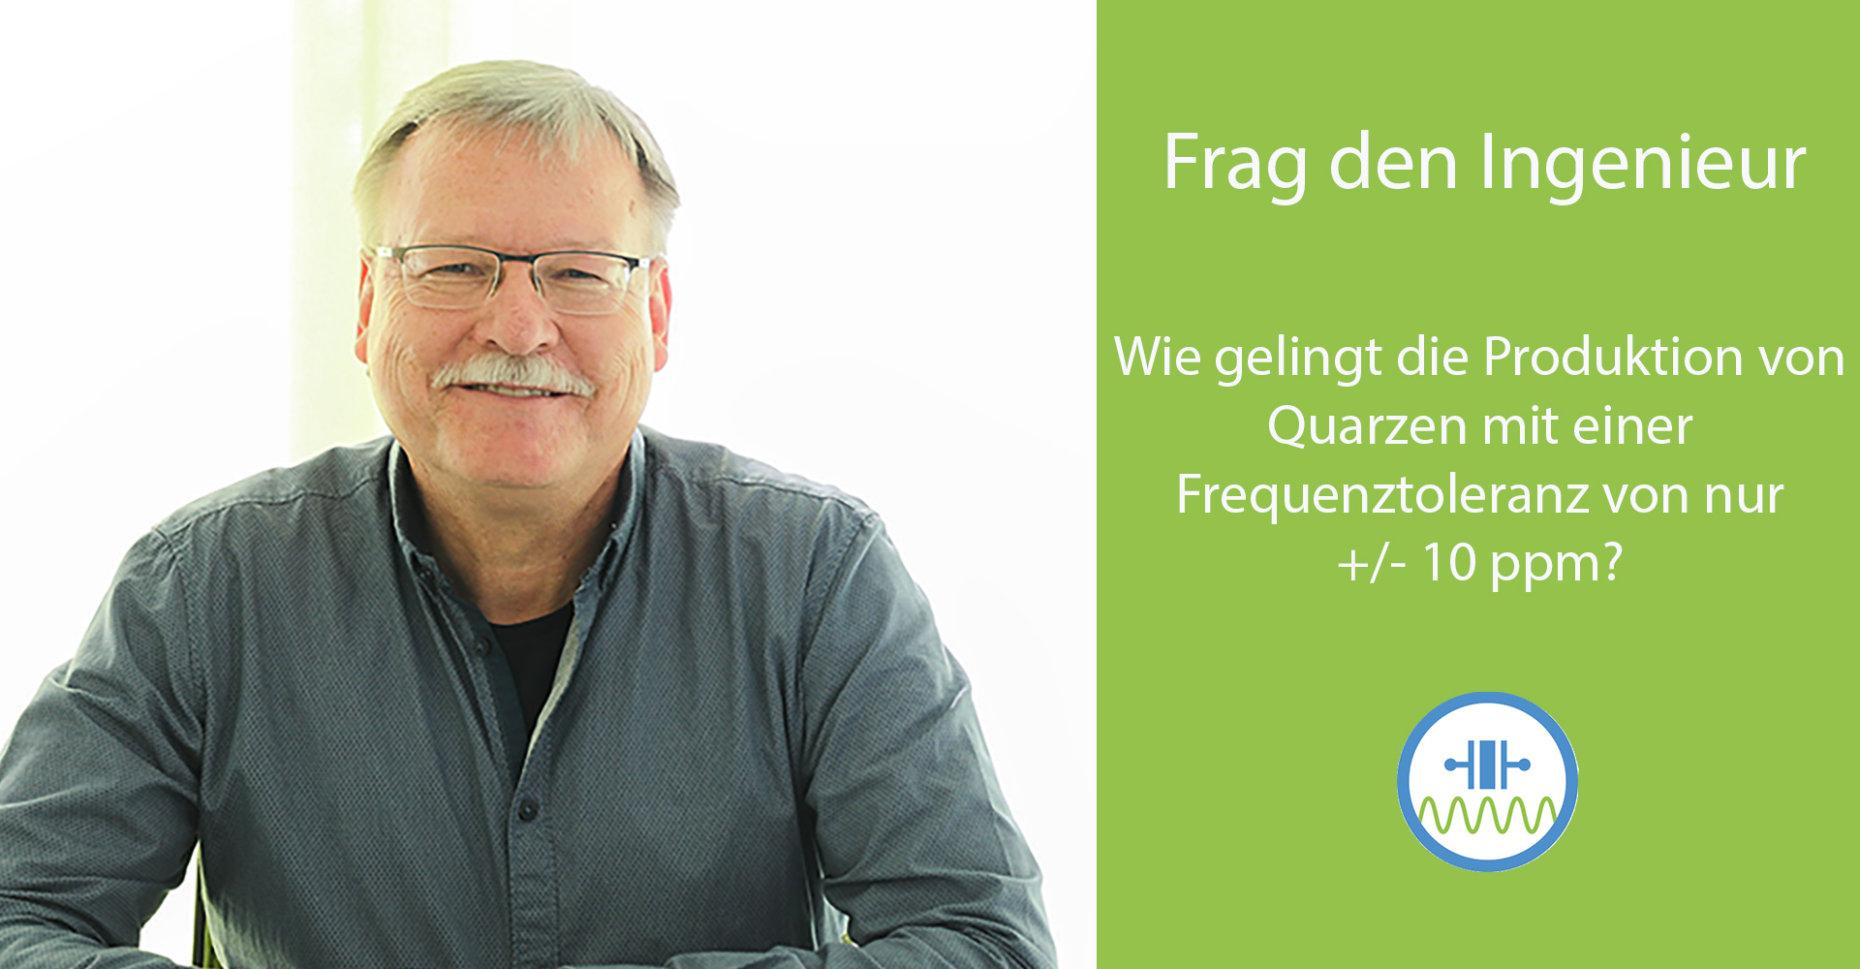 Christian Büchler, Head of Technical Support, bei Jauch Quartz